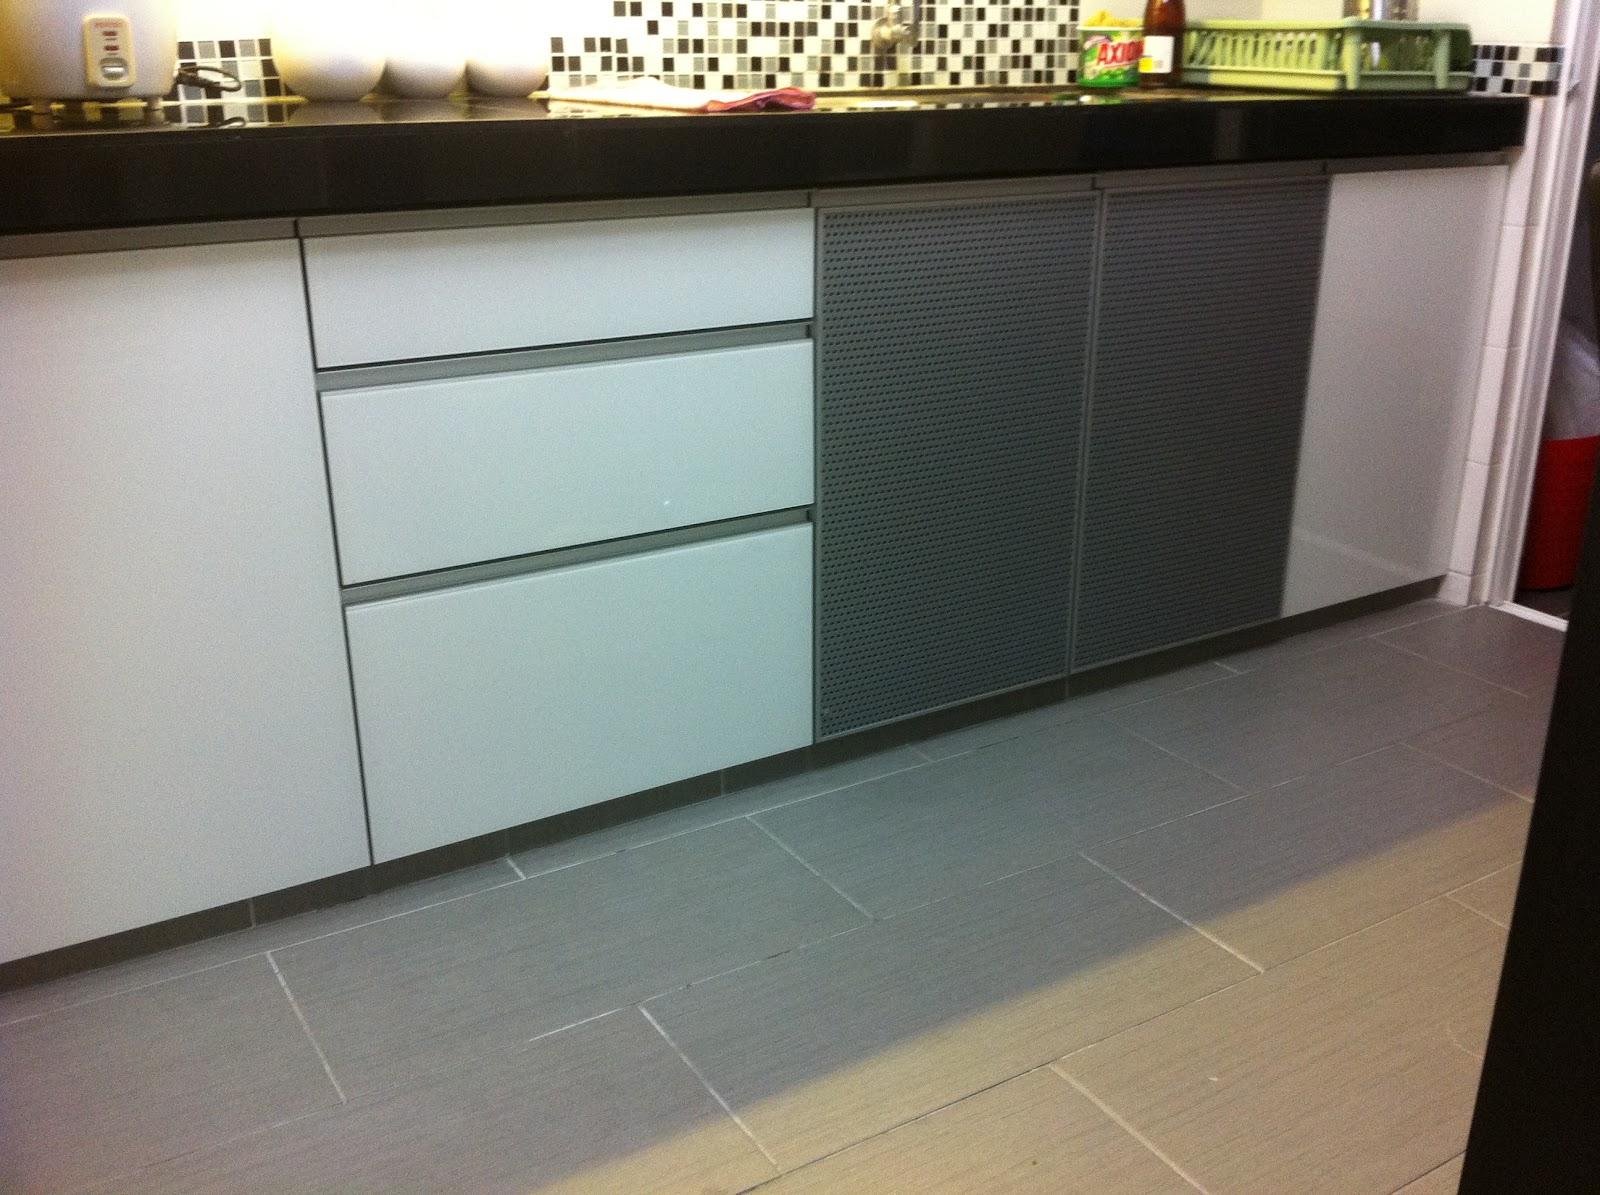 Kitchen kabinet dan kos pengubahsuaian dapur nama saya for Kitchen kabinet